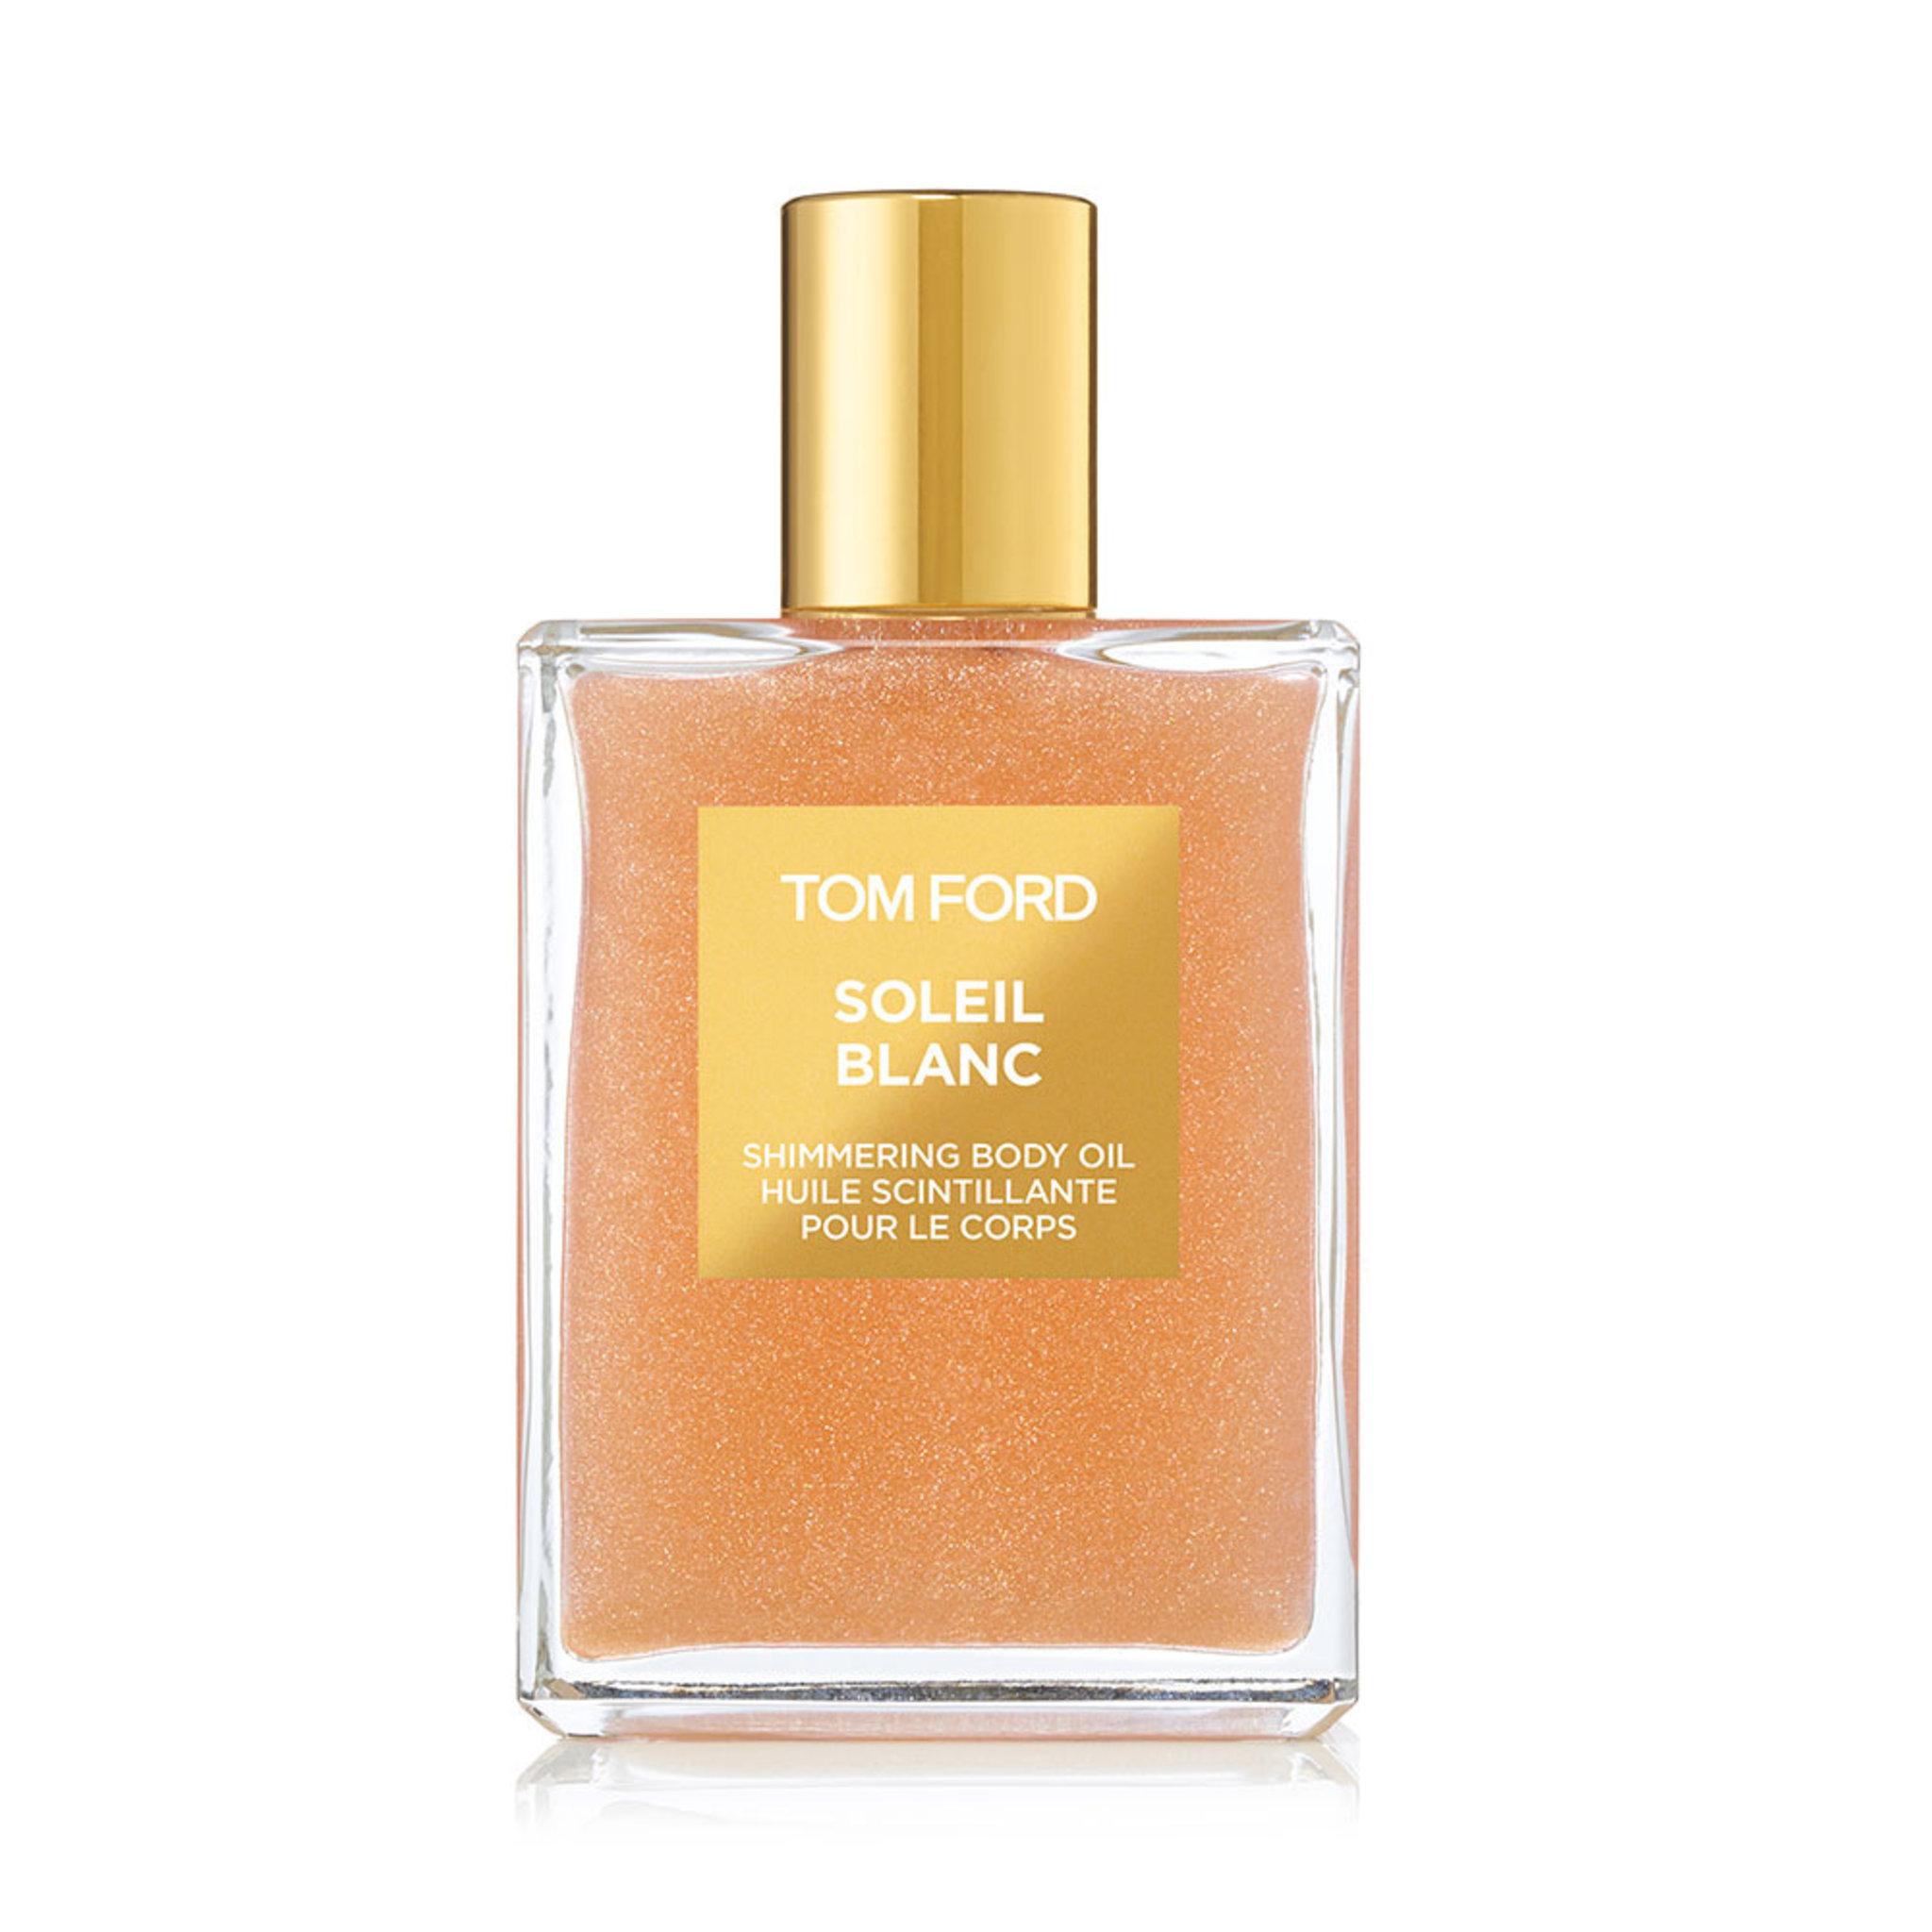 Soleil Blanc Shimmering Body Oil Rose Gold , 100 ML